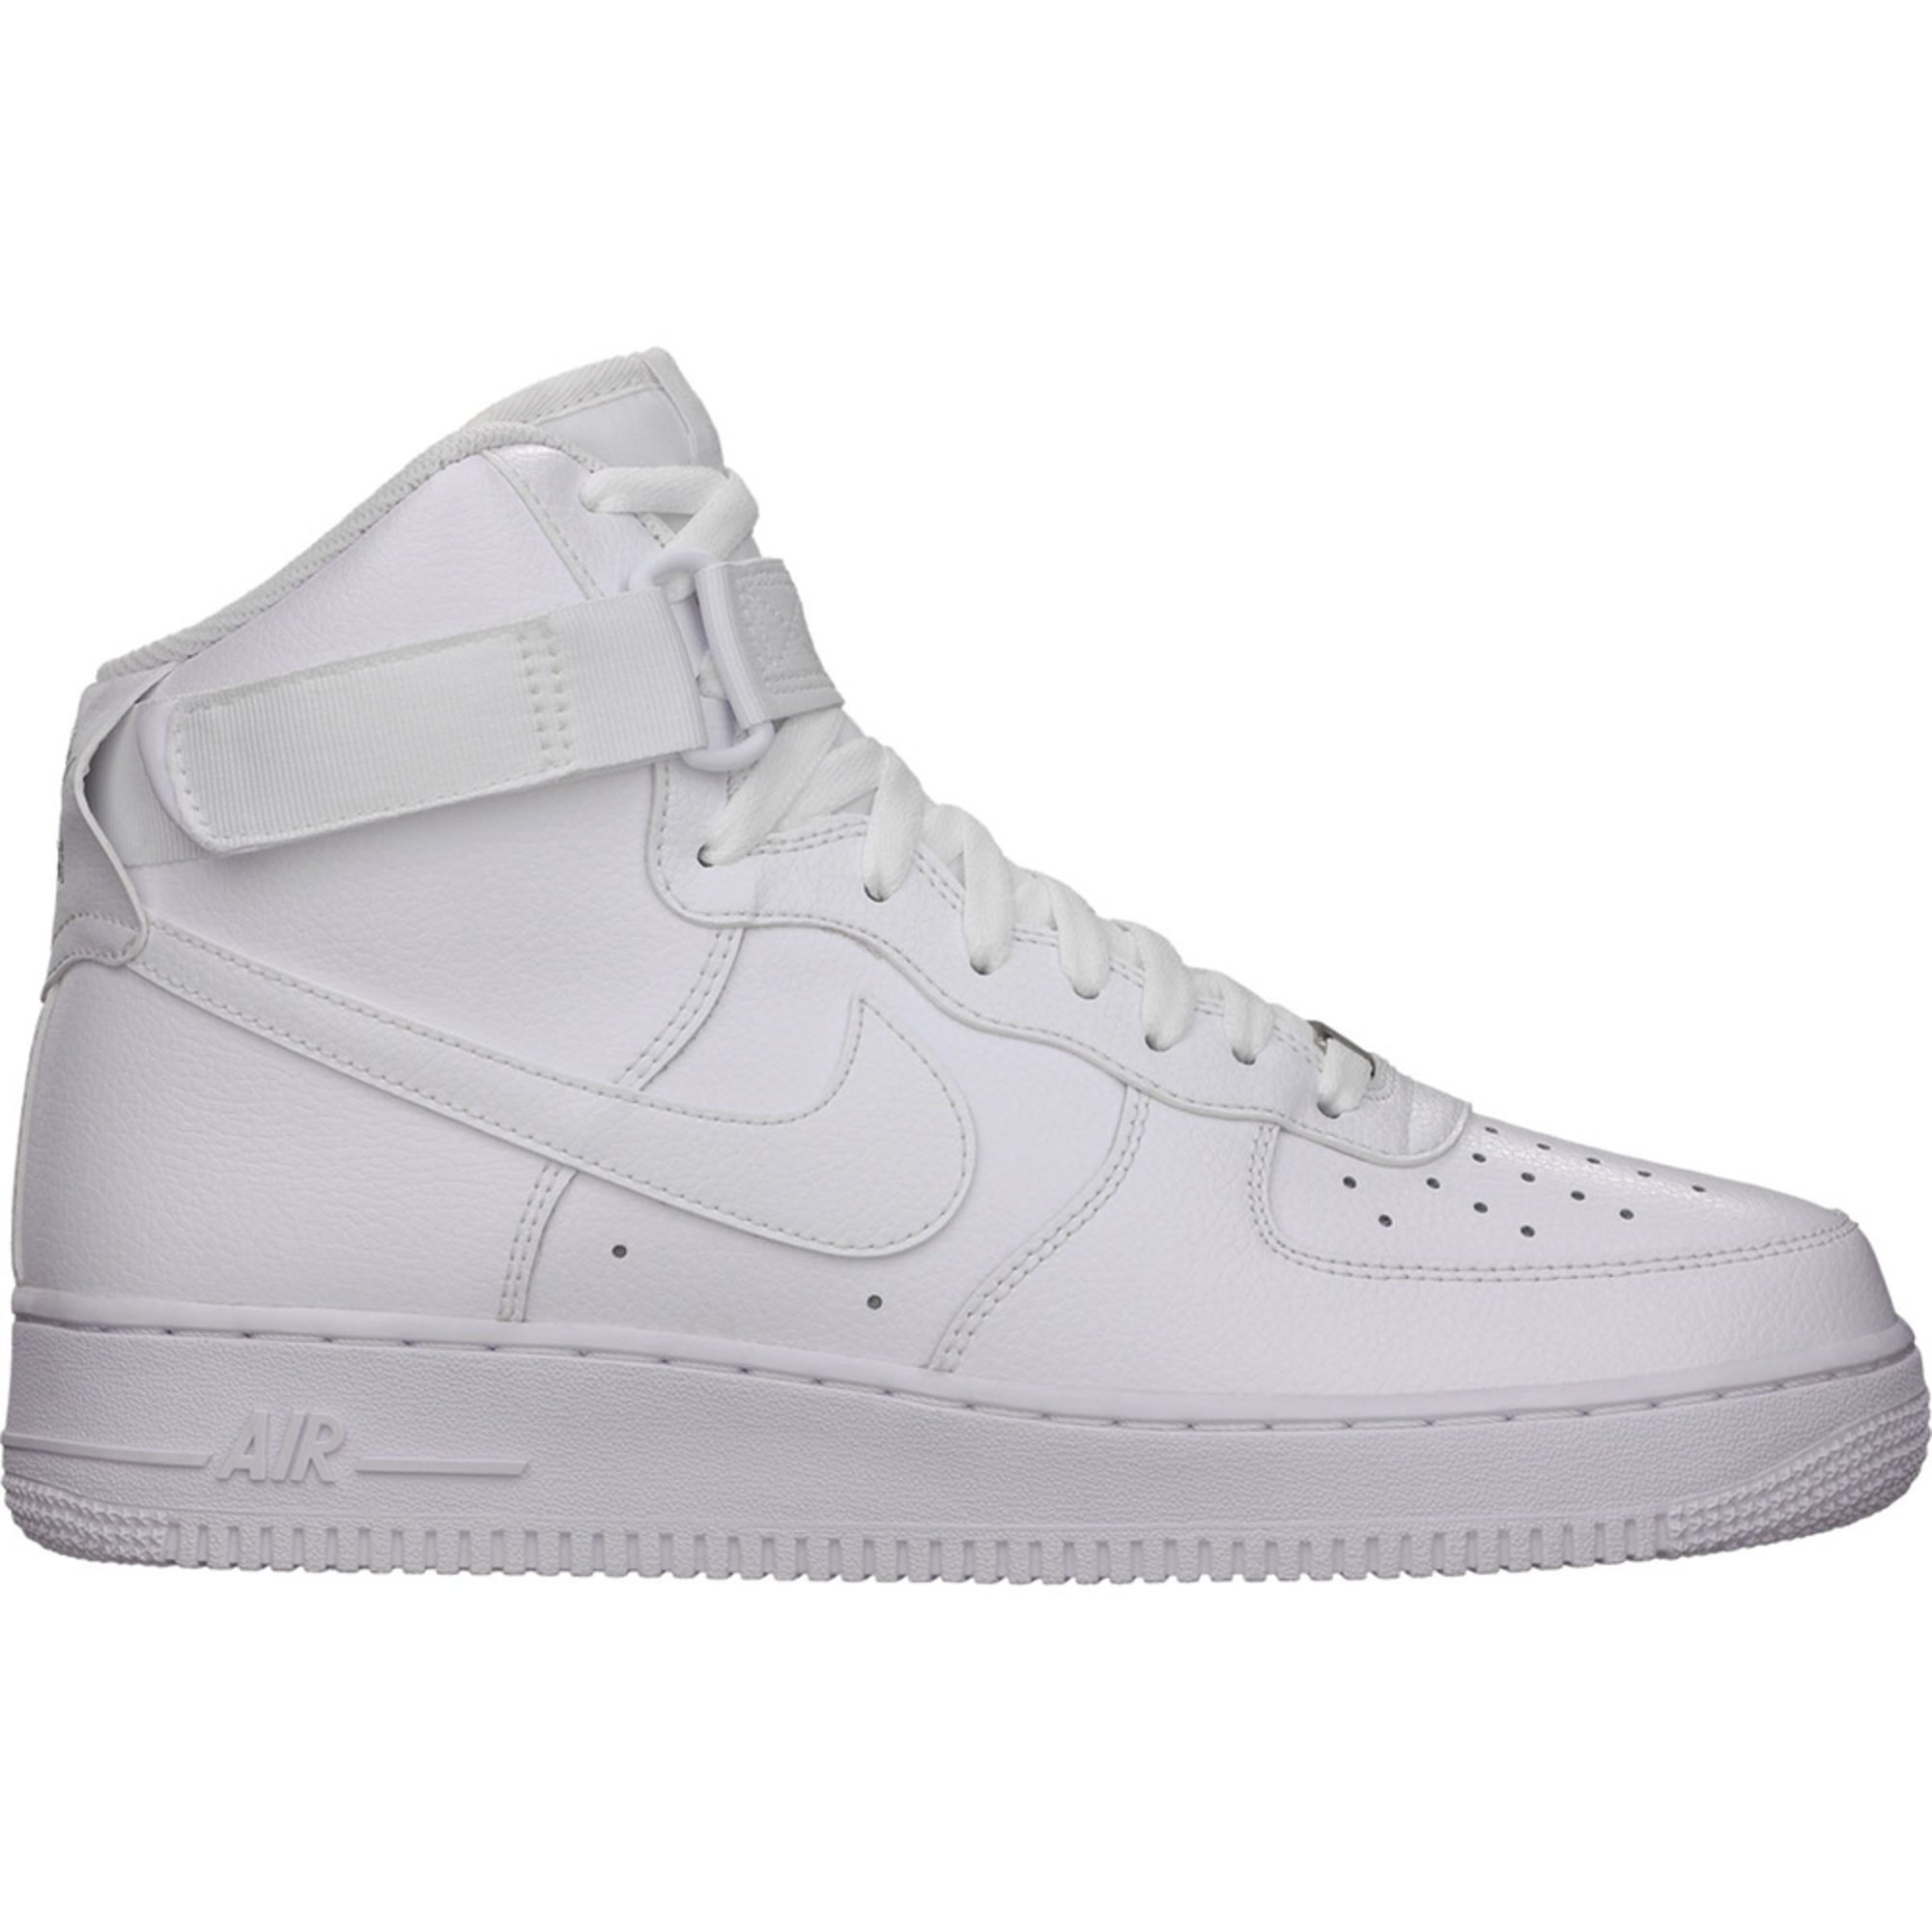 0d4b9c905829 Nike. Nike Men s Air Force 1 High 07 Basketball Shoe